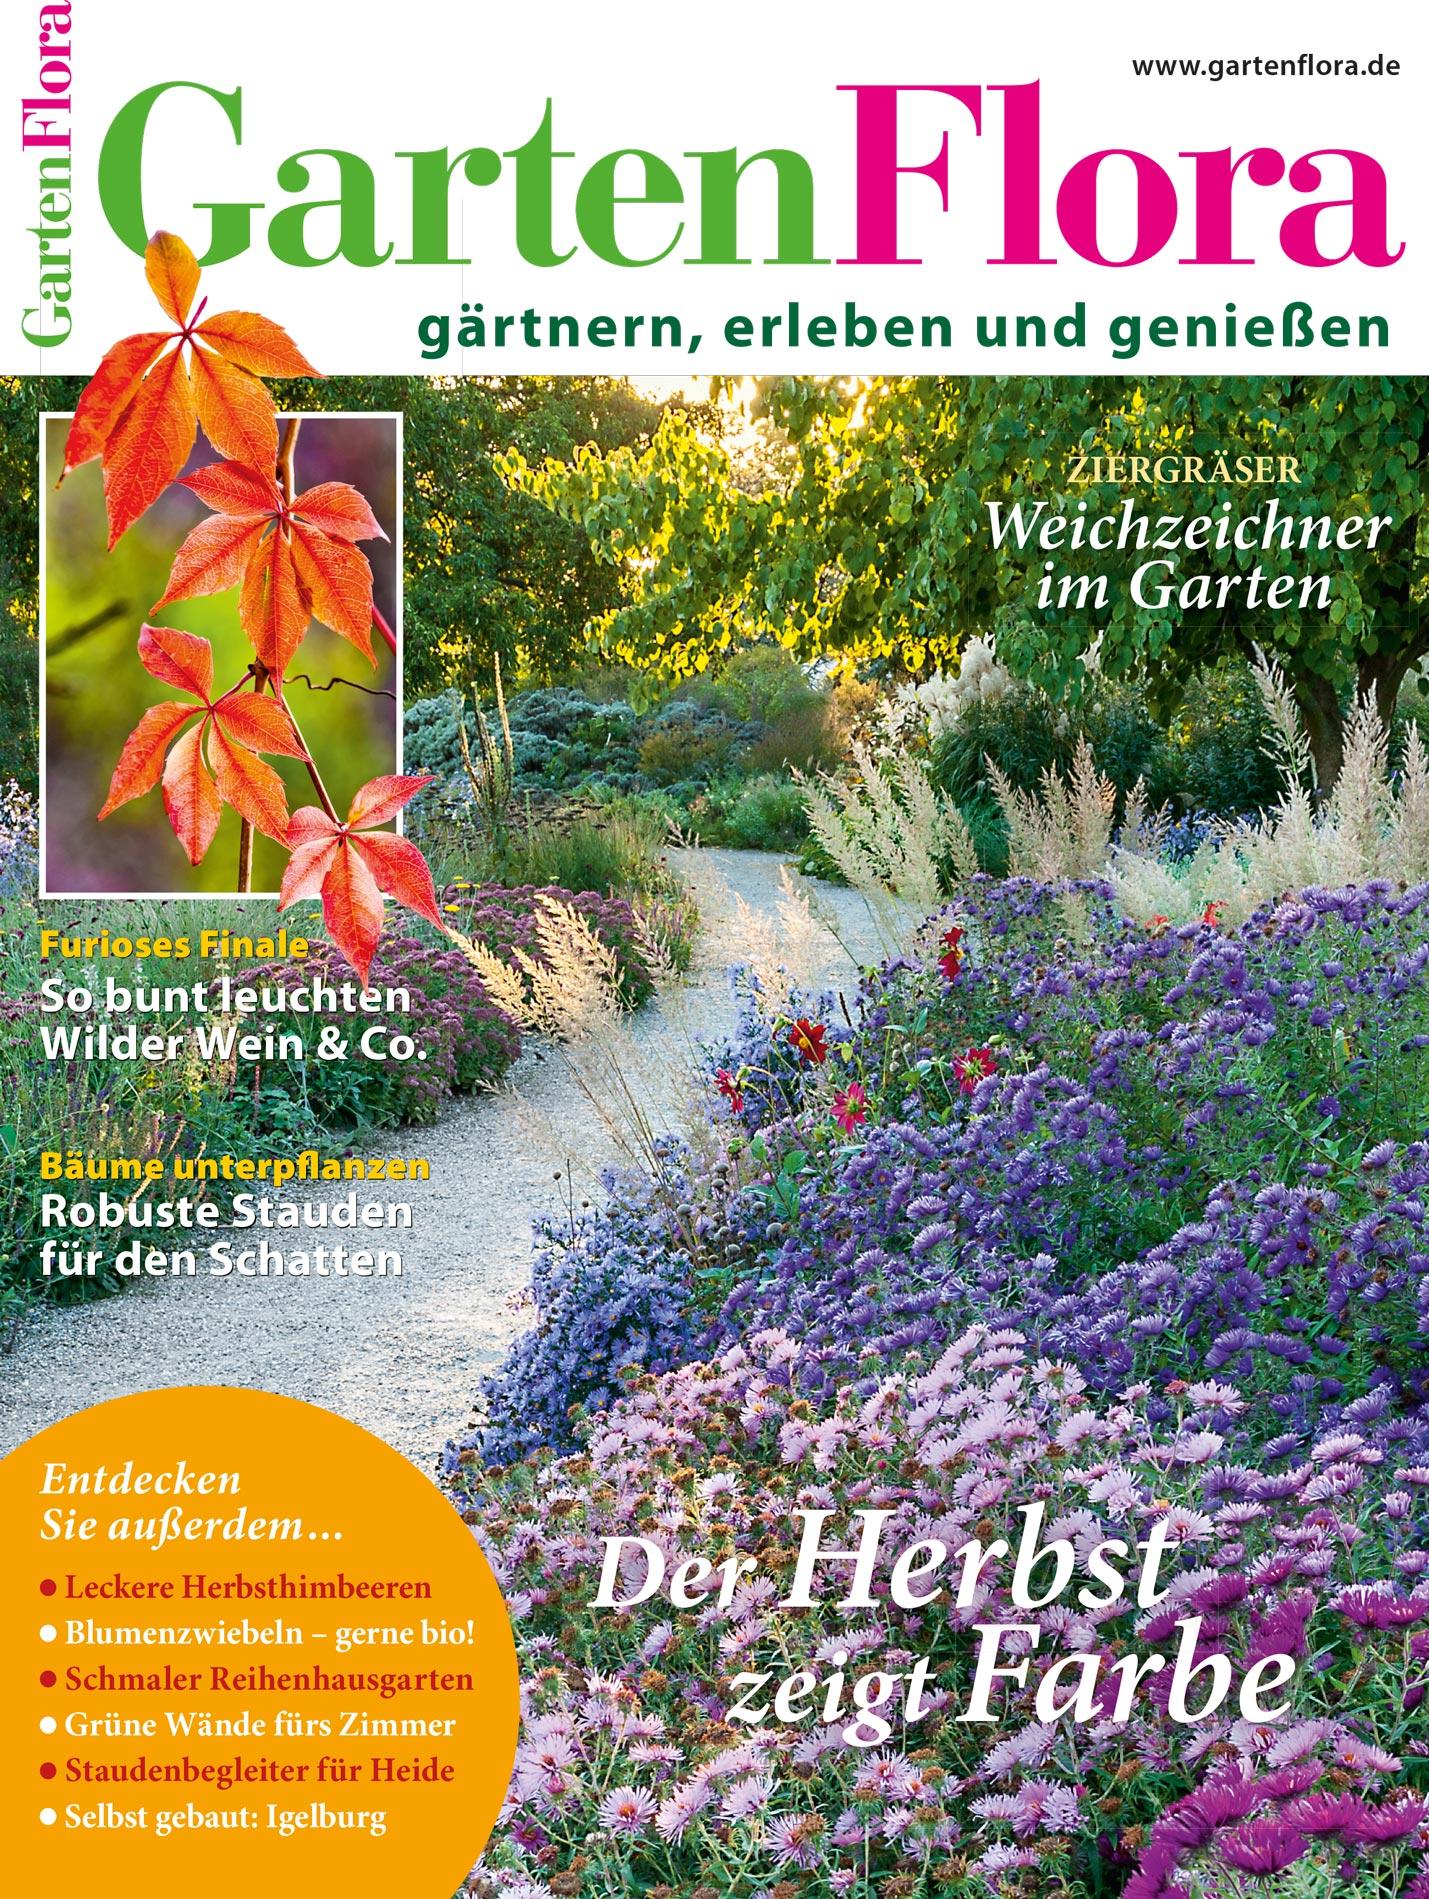 Garten Flora Igelhaus bauen